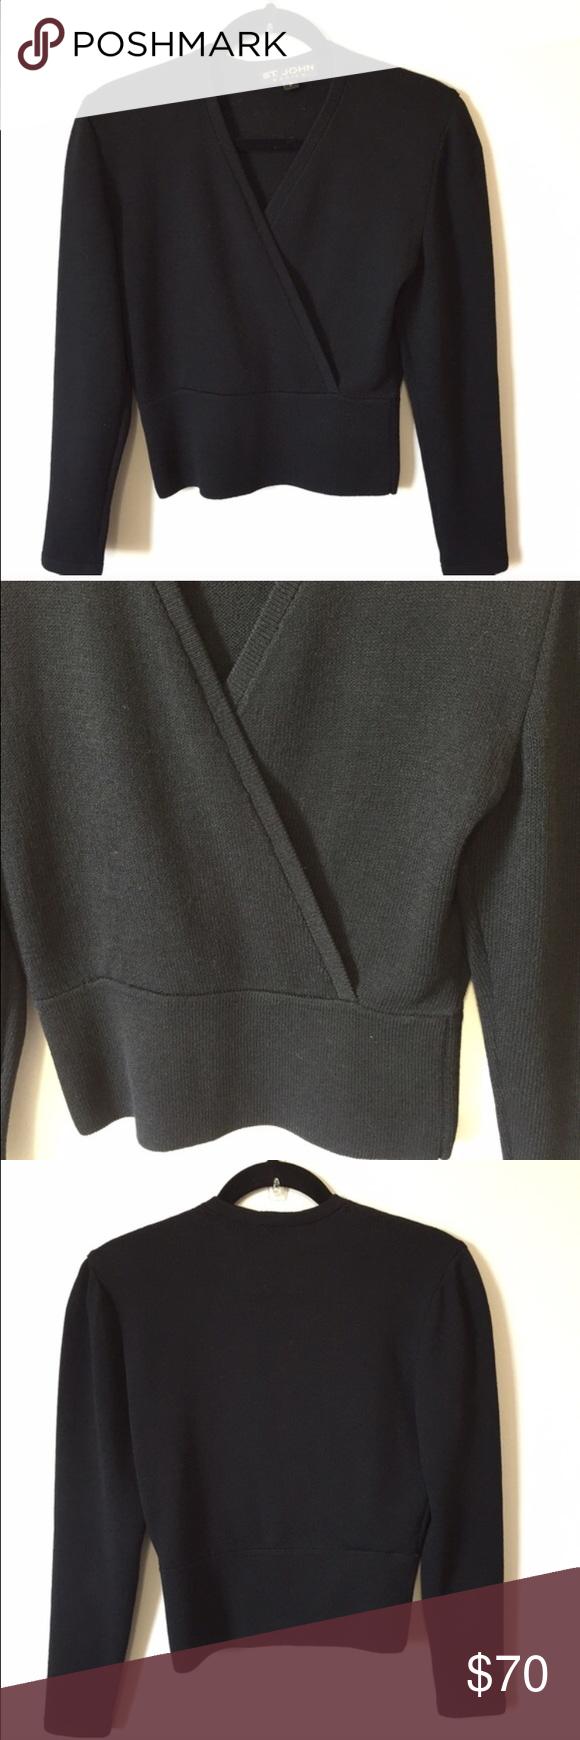 St John Faux Wrap Knit Top Size petite Hits above hip Long sleeve